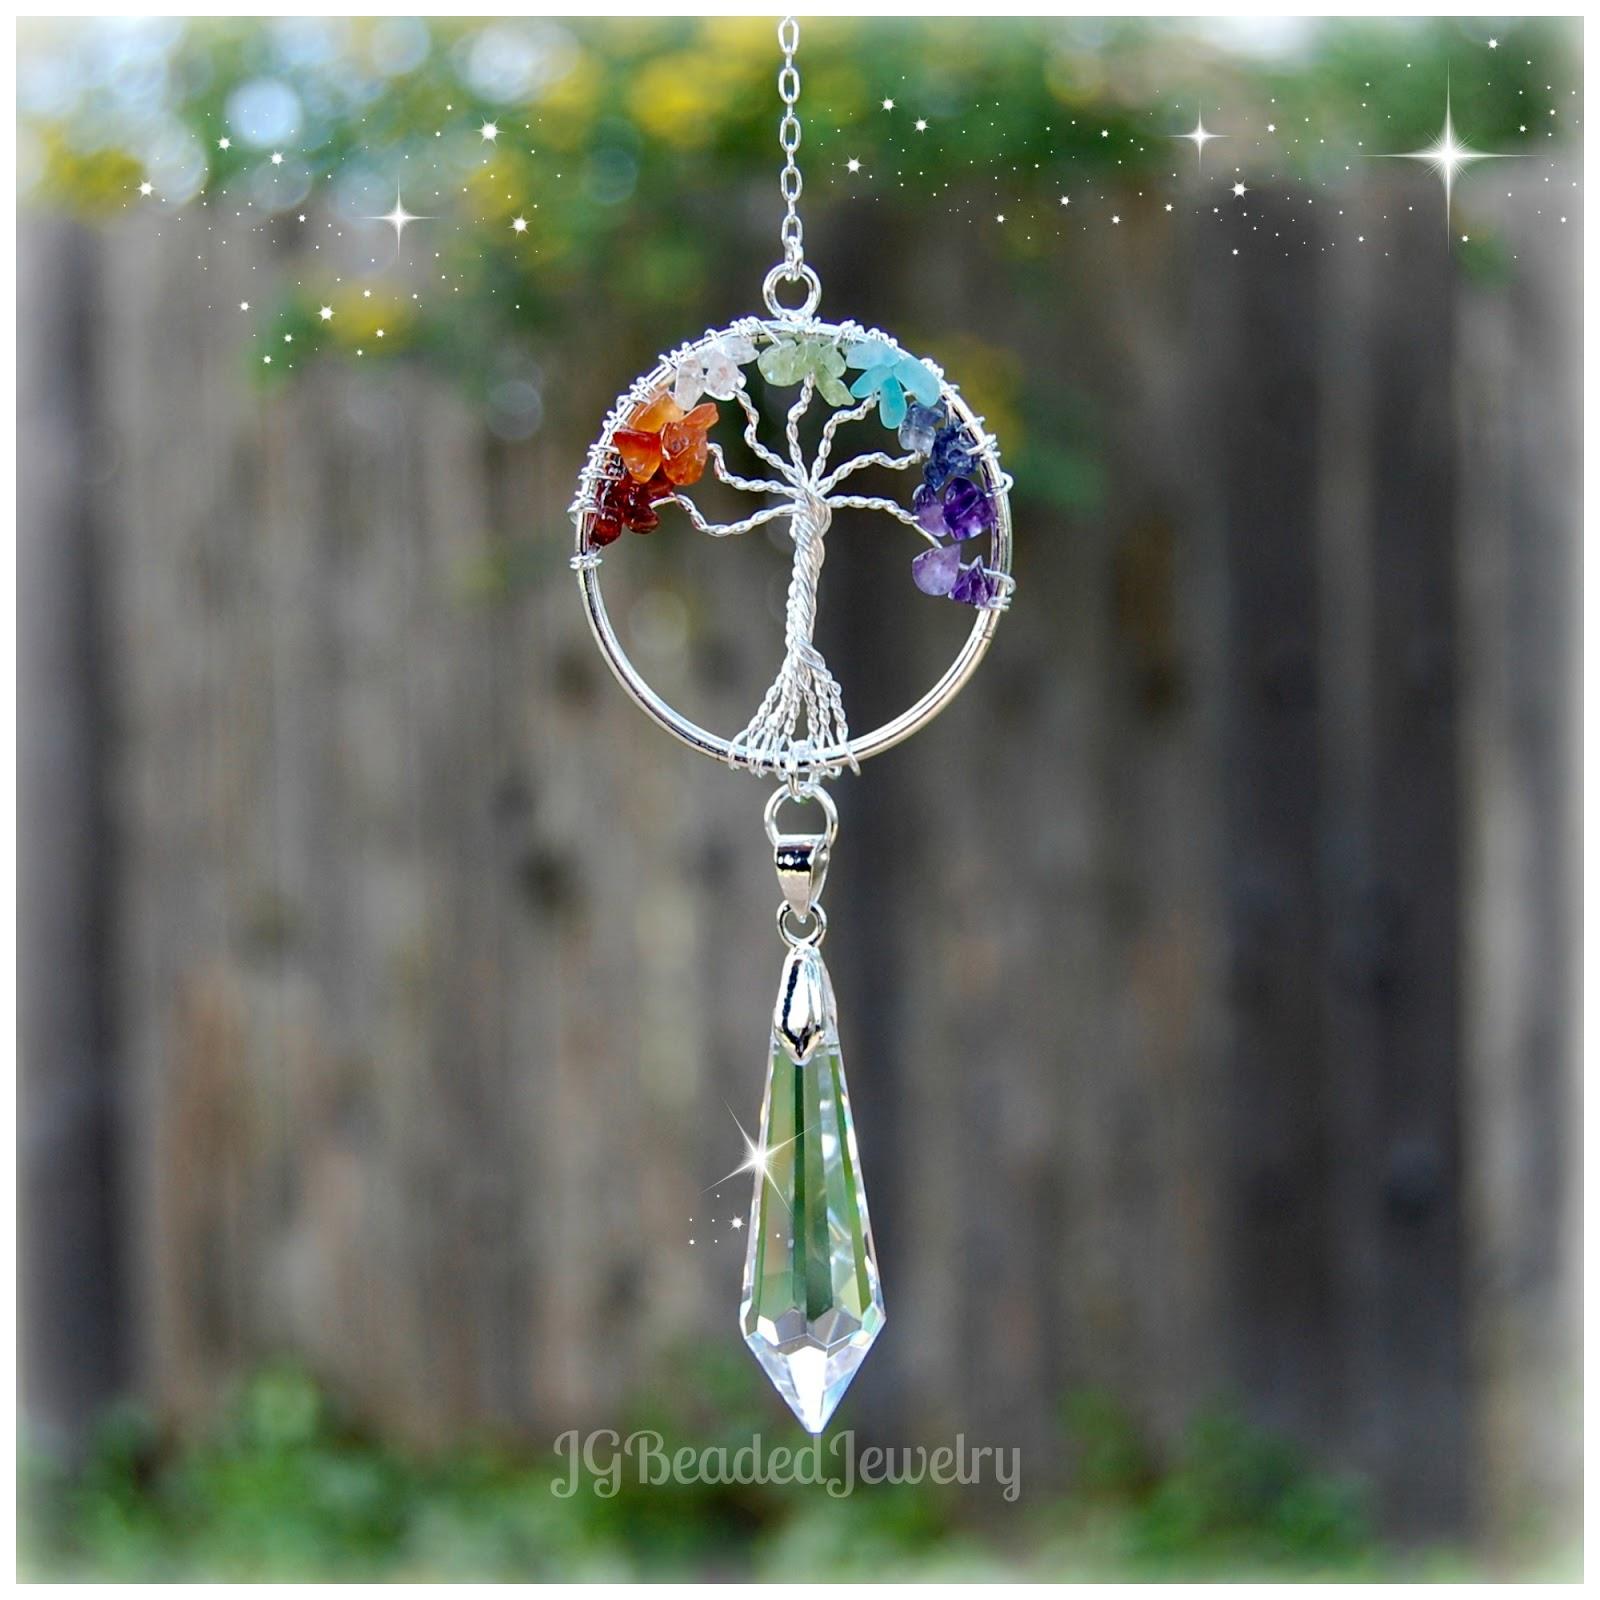 JG Beaded Jewelry Tree Of Life Crystal Suncatcher